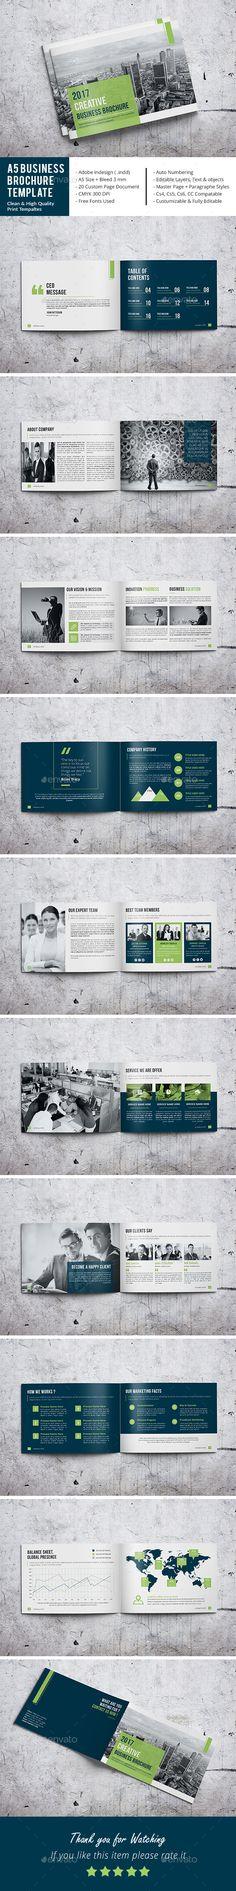 A5 Business Brochure Template - Corporate Brochures   Download: https://graphicriver.net/item/a5-business-brochure-template/18668862?ref=sinzo